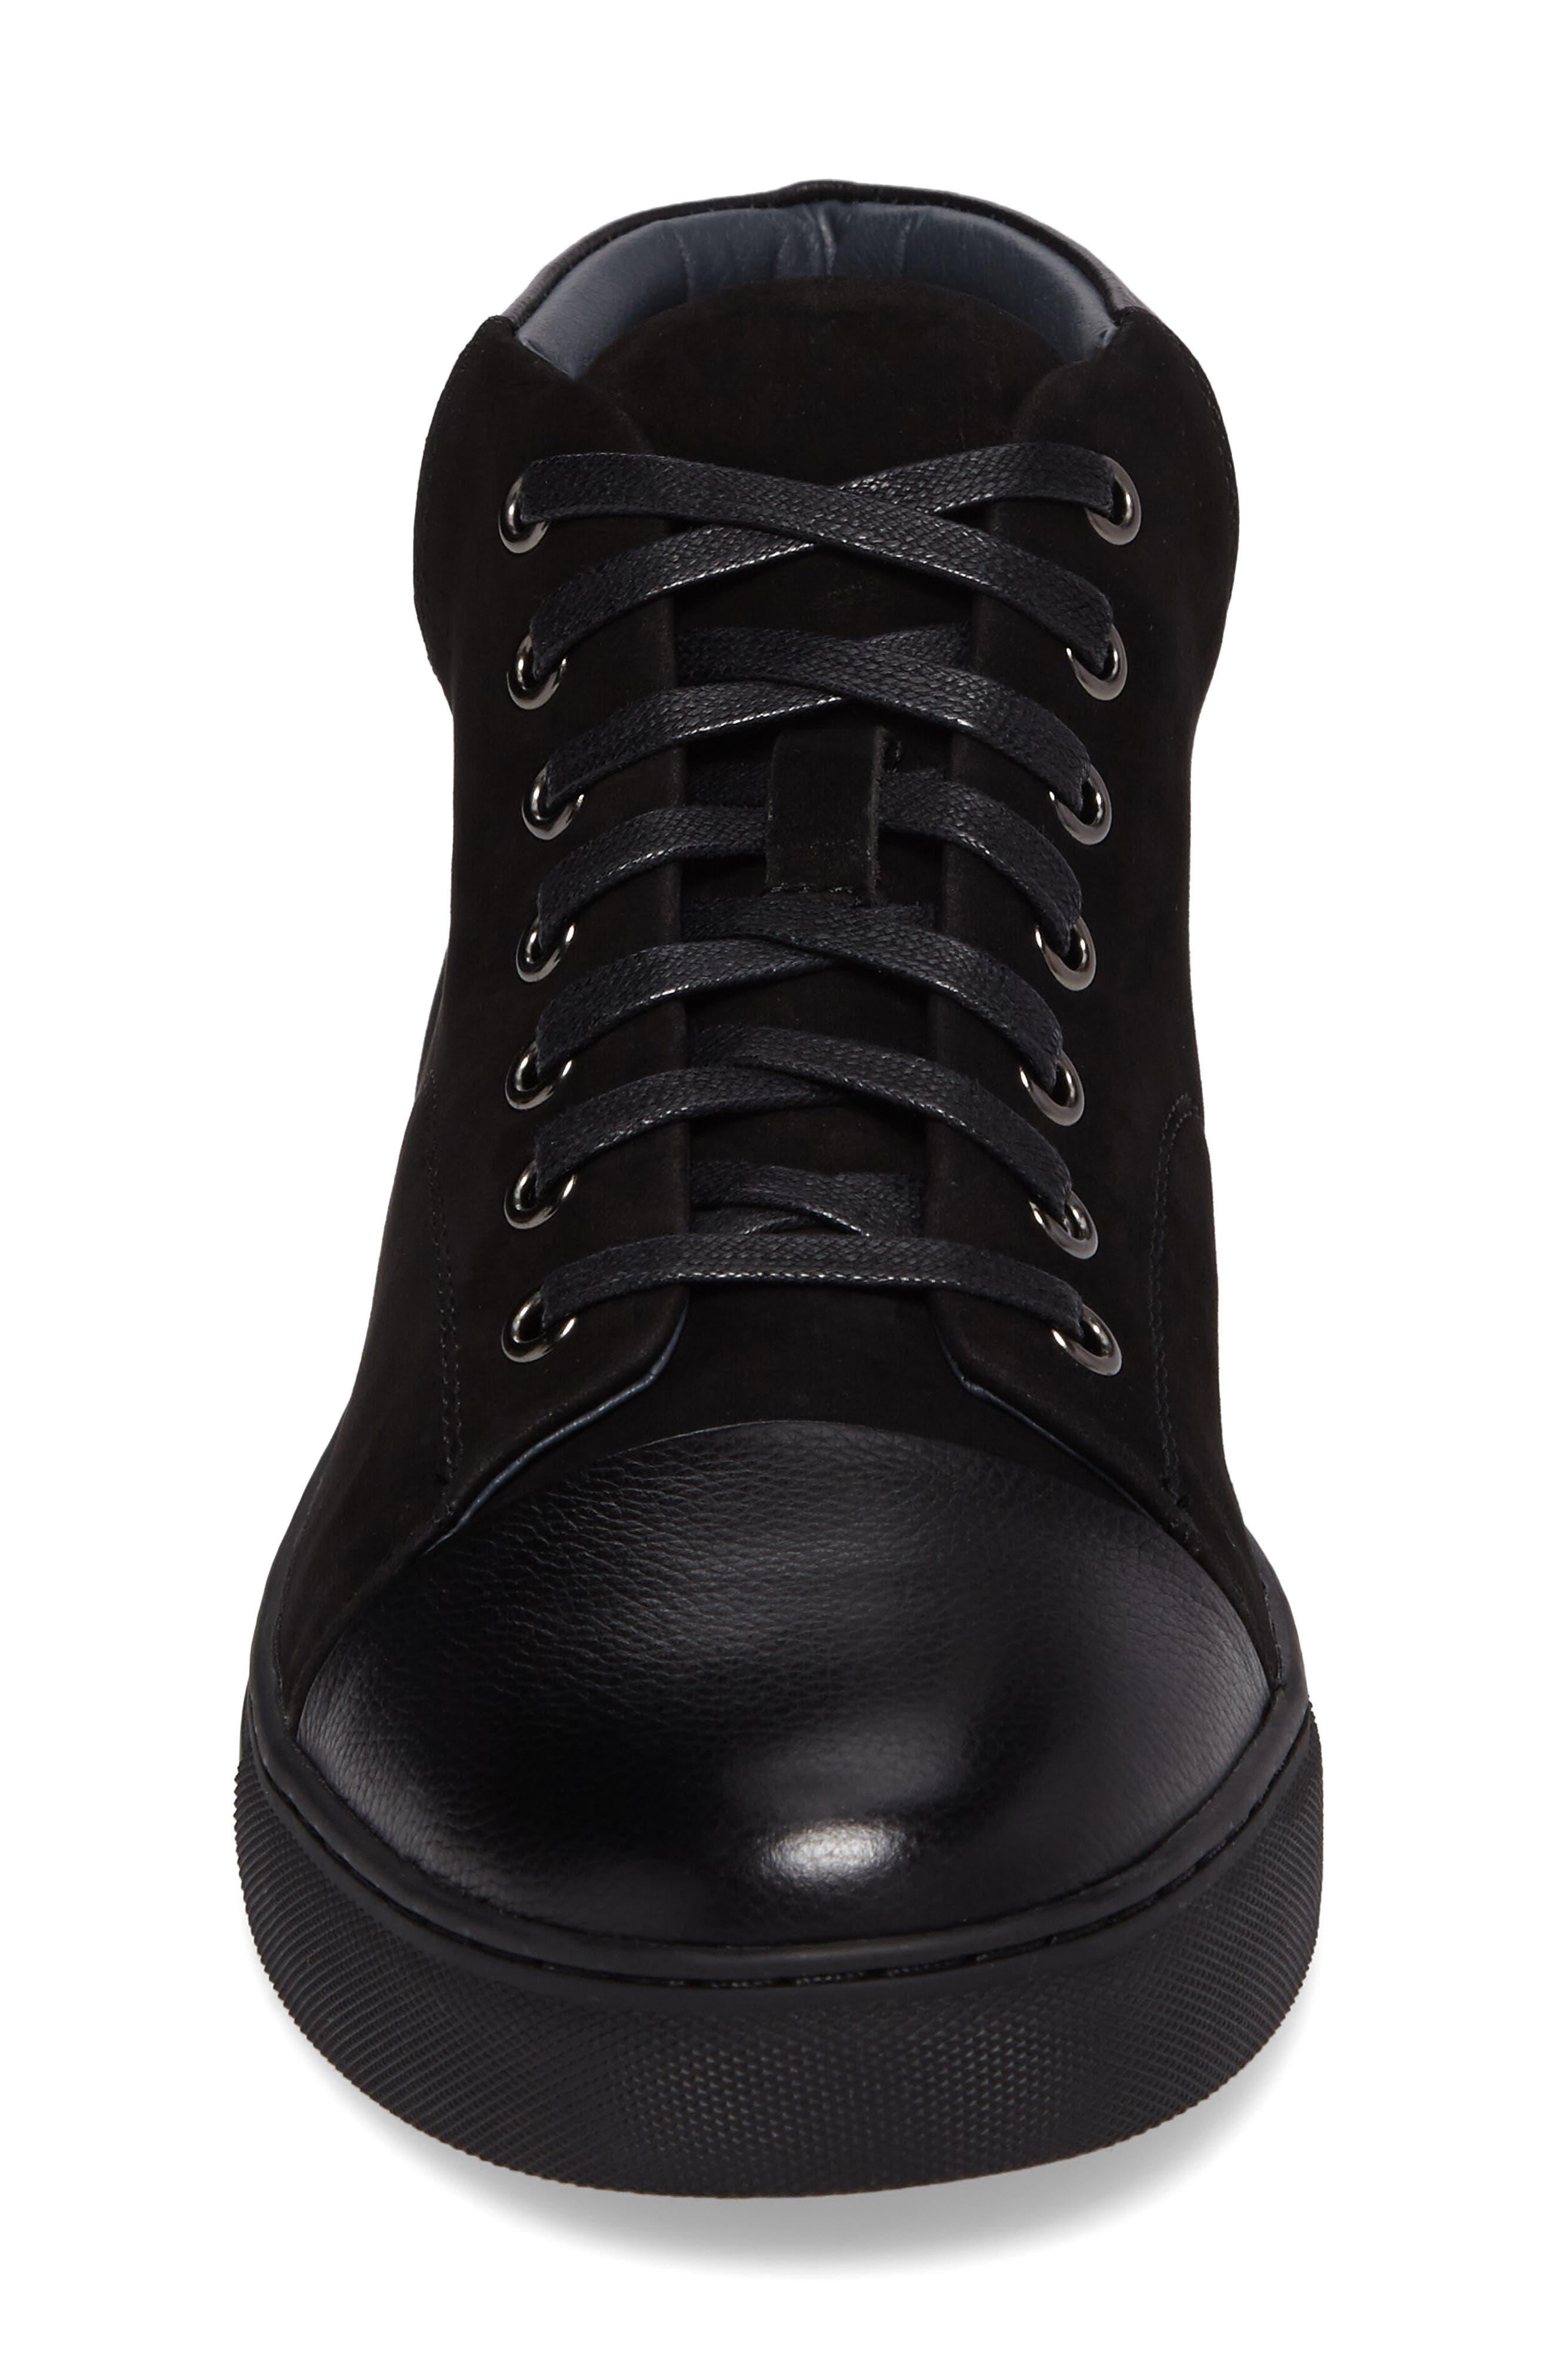 Landseer Sneaker,                             Alternate thumbnail 4, color,                             001